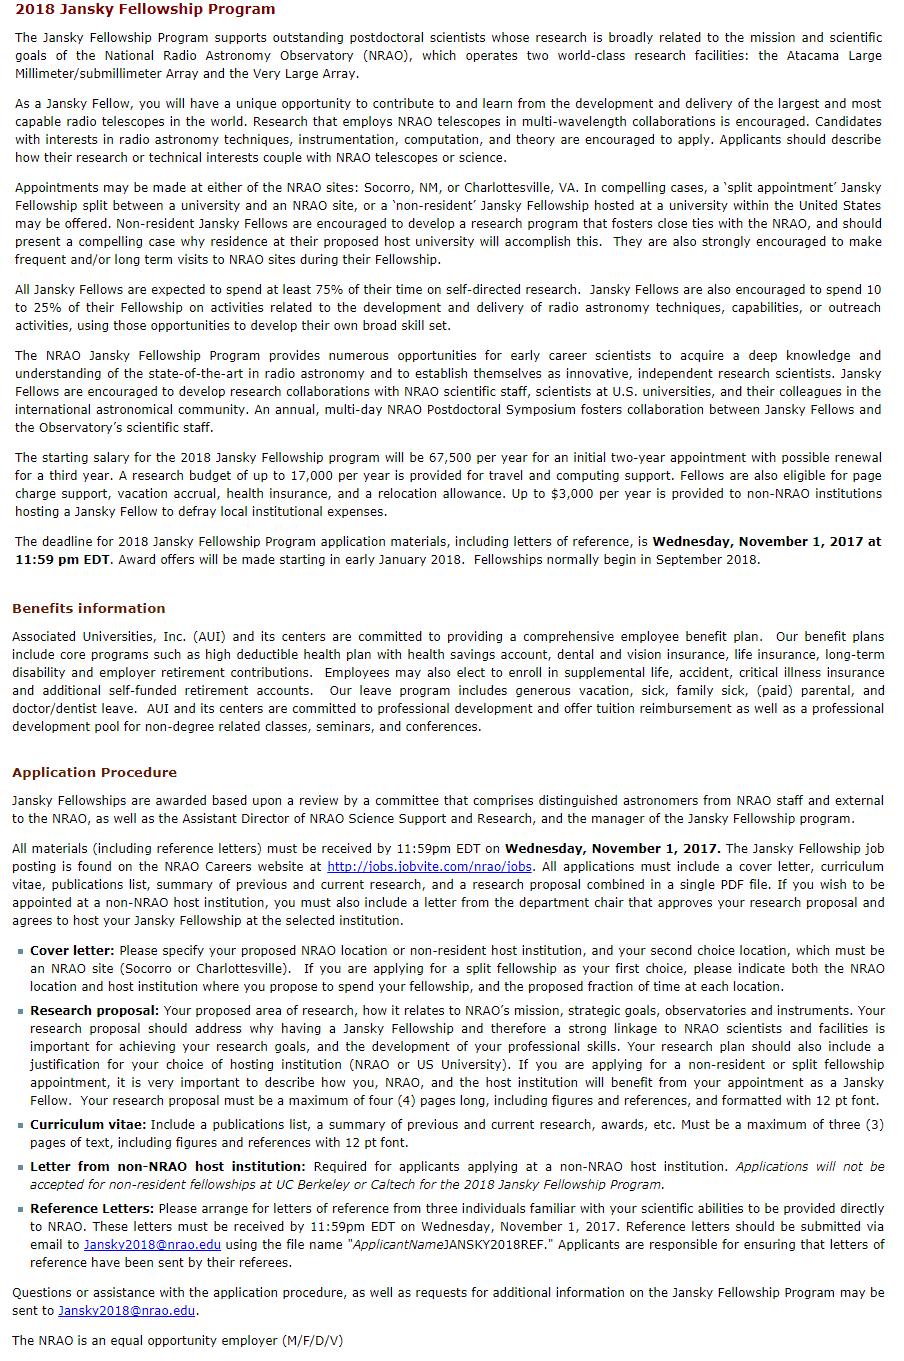 NRAO Jansky Postdoctoral Fellowship Program for International Students in USA